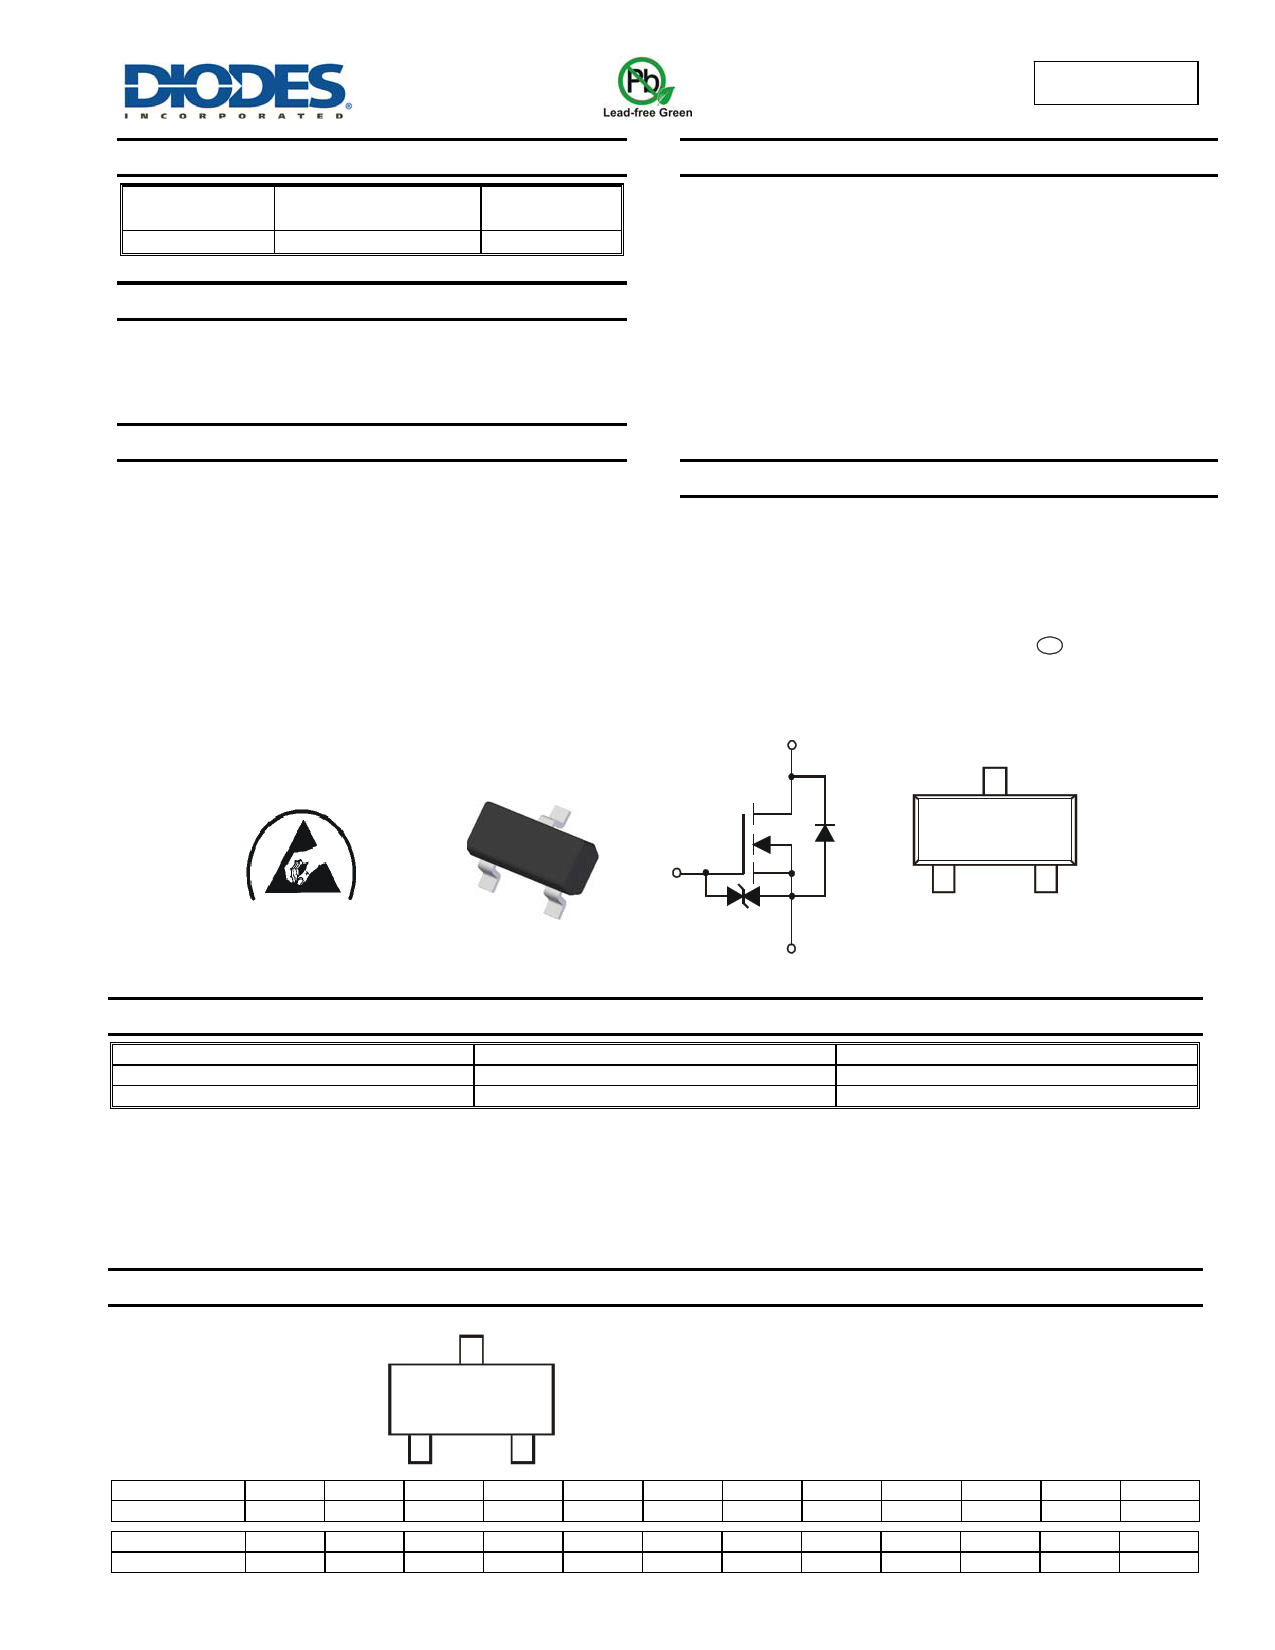 2N7002AQ Datasheet